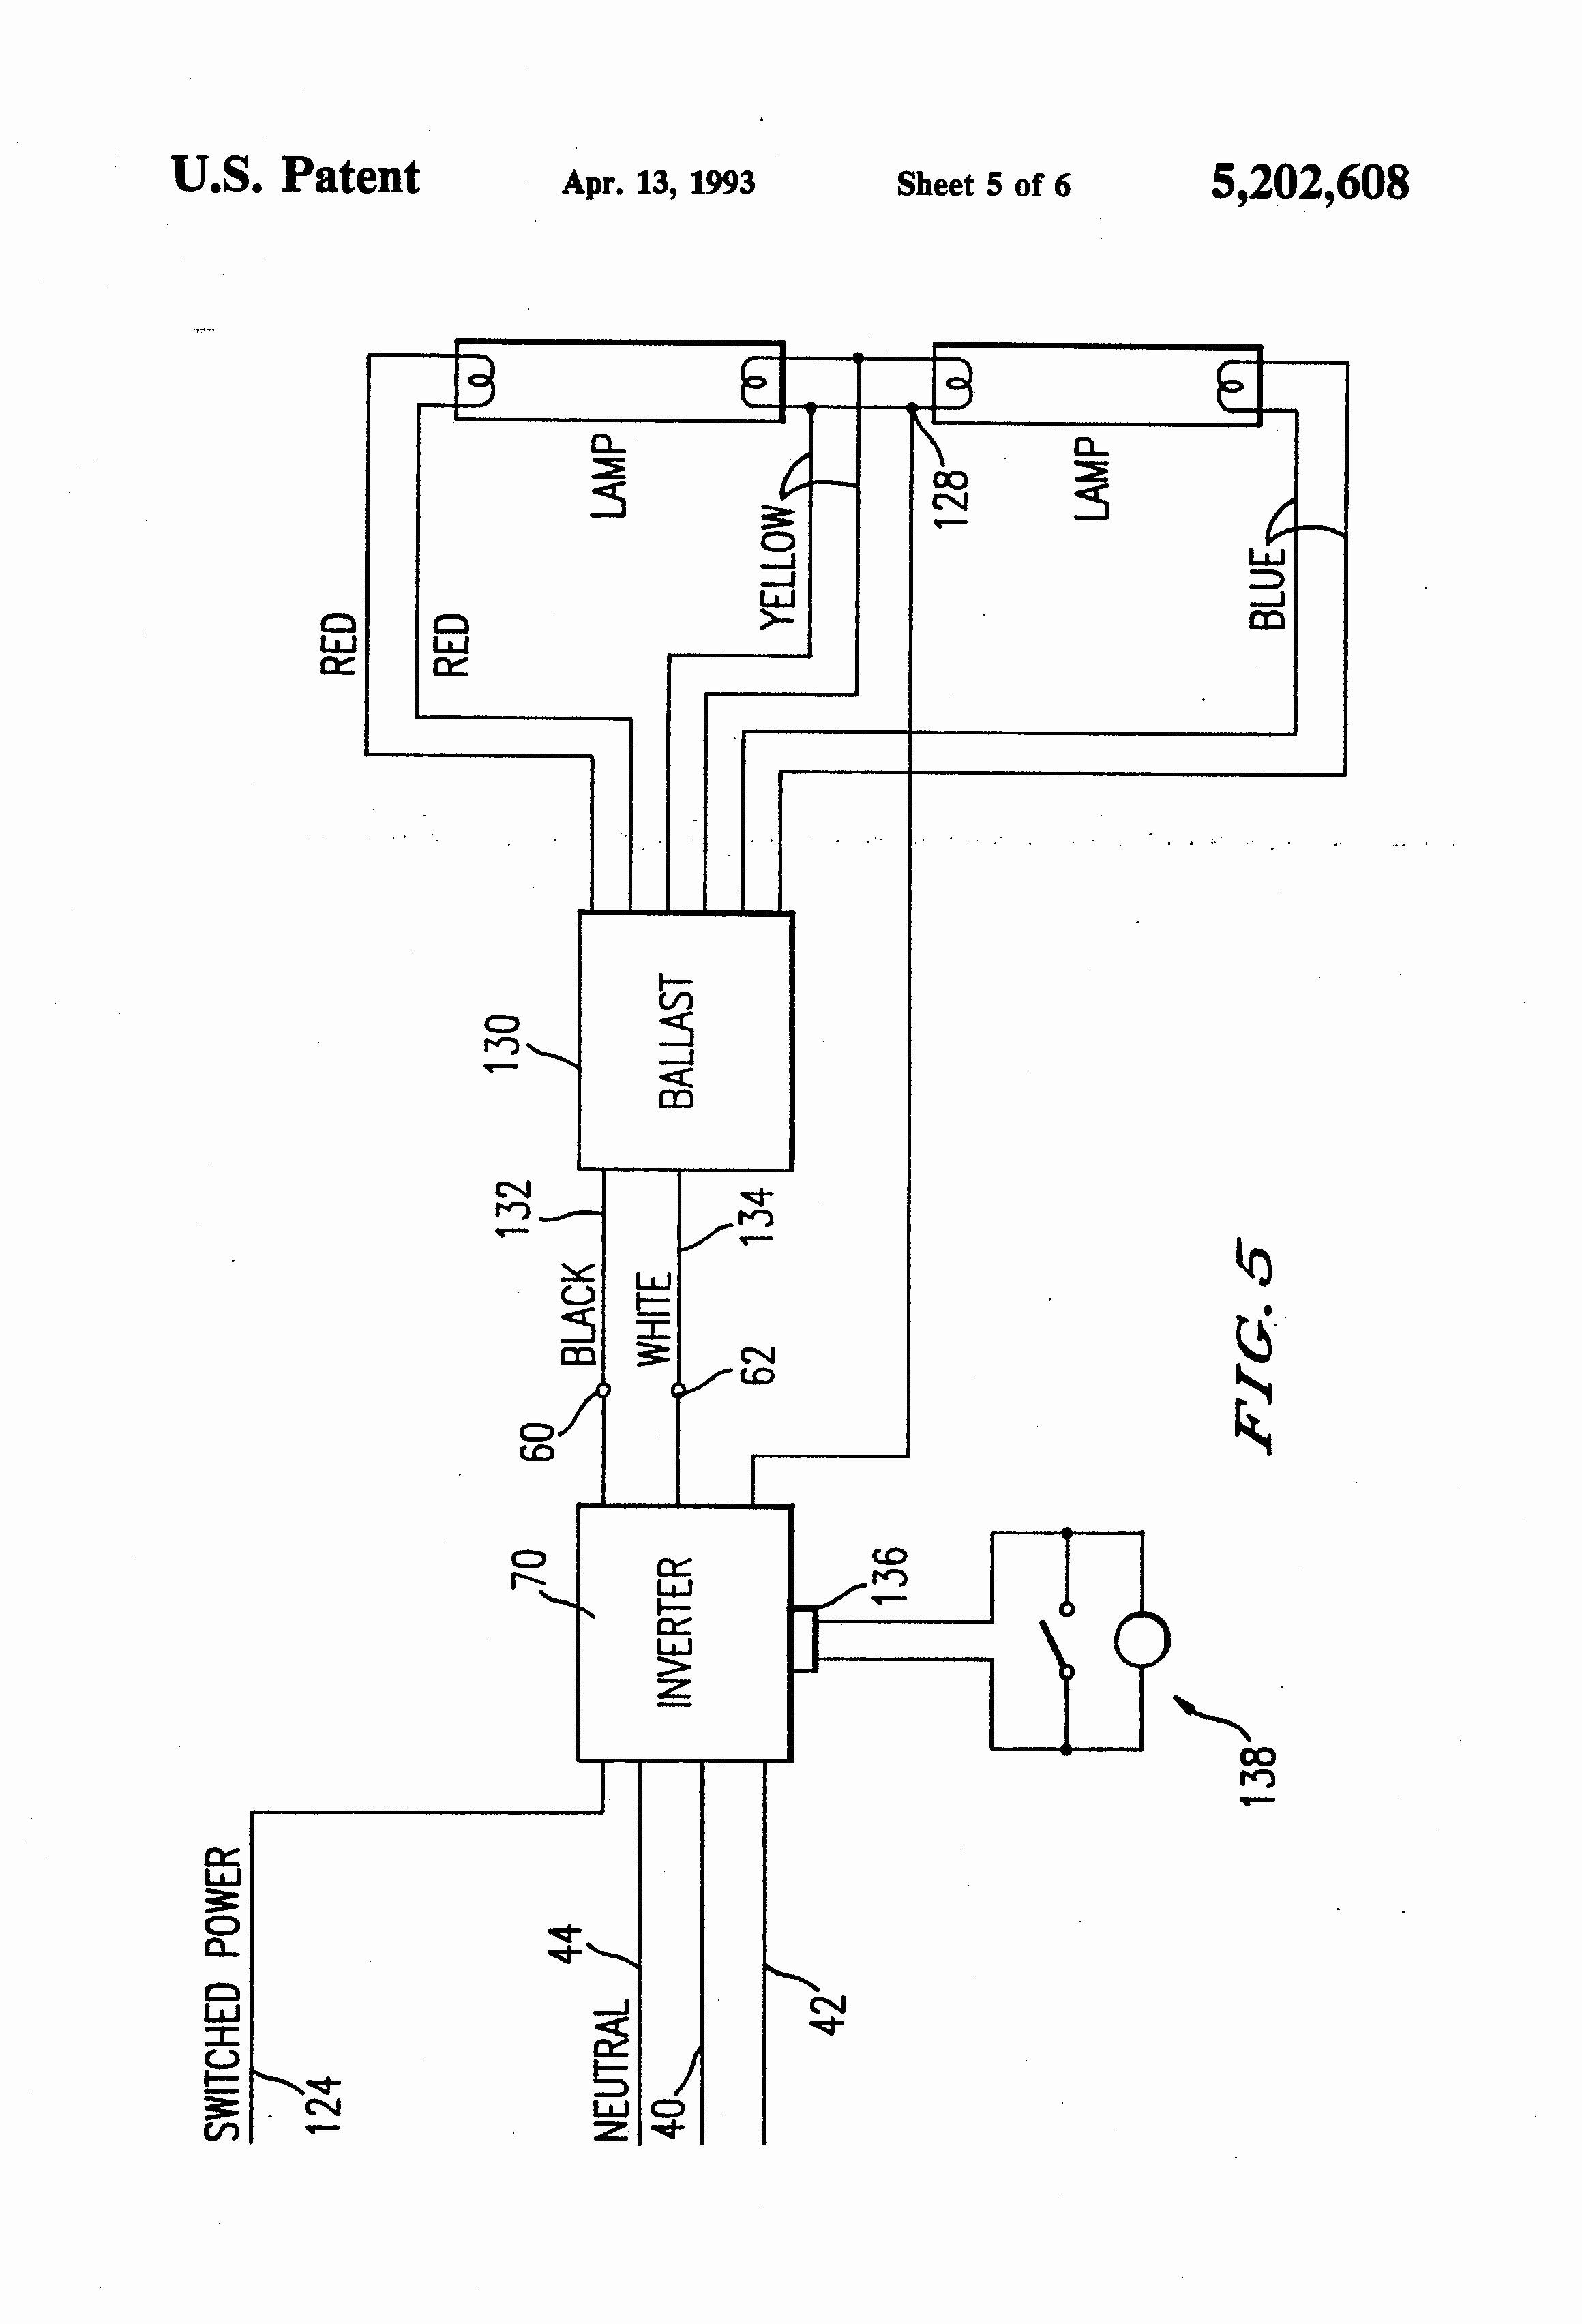 4 Foot Light Fixture Ballast Wiring Diagram   Wiring Diagram - 4 Lamp 2 Ballast Wiring Diagram